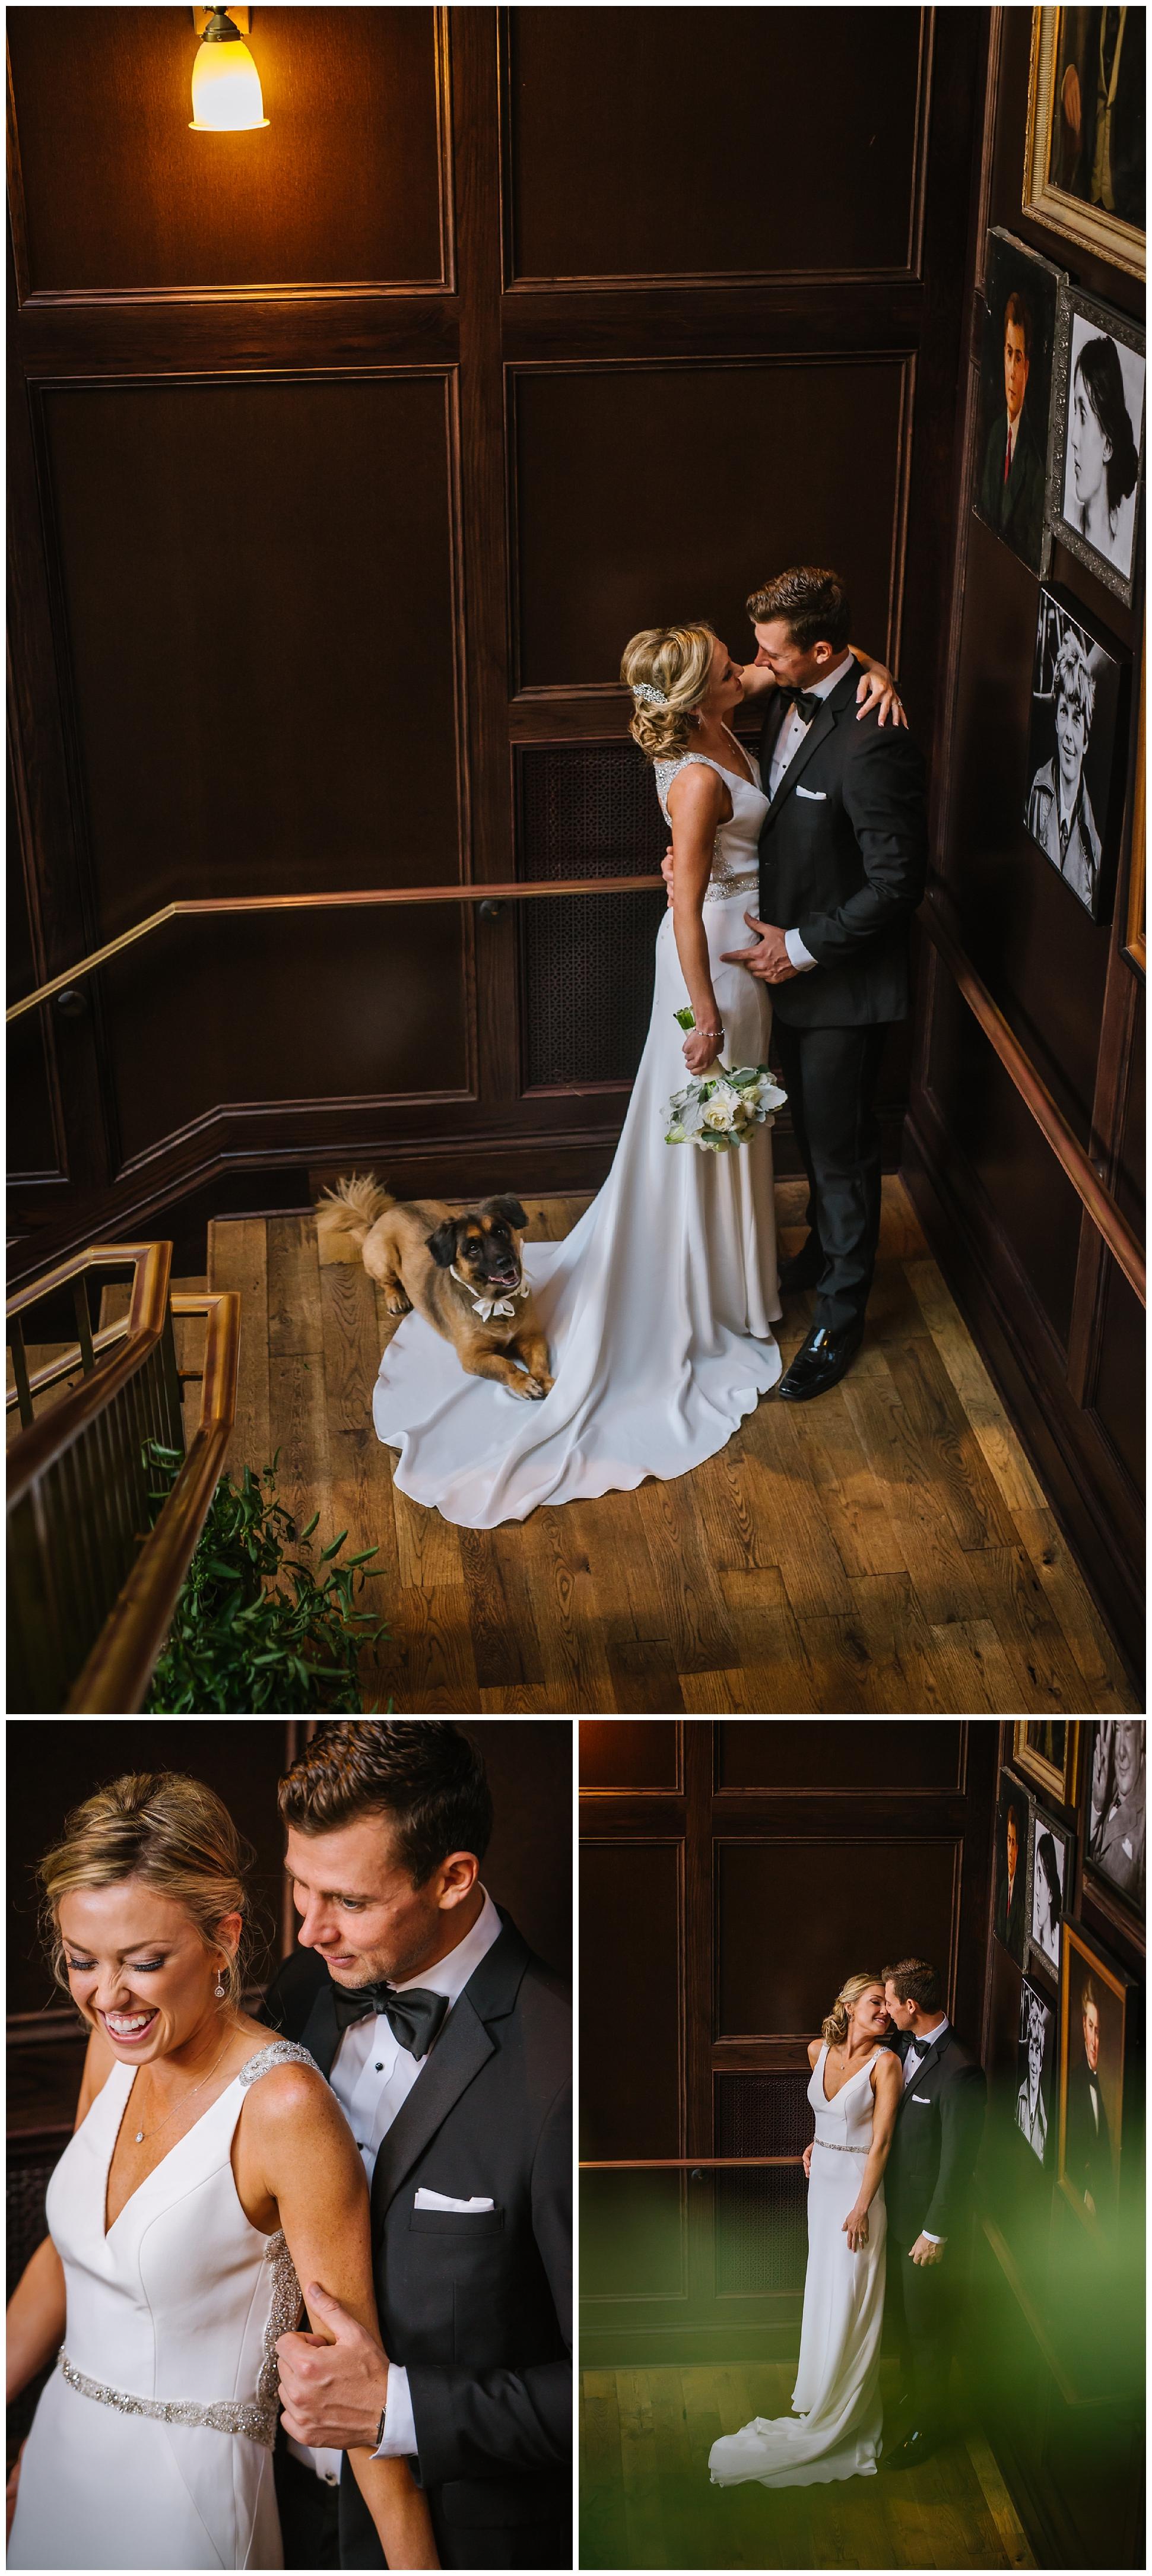 Oxford-exchange-wedding-photogapher-garland-candels-bookstore-burgandy-botanica_0031.jpg